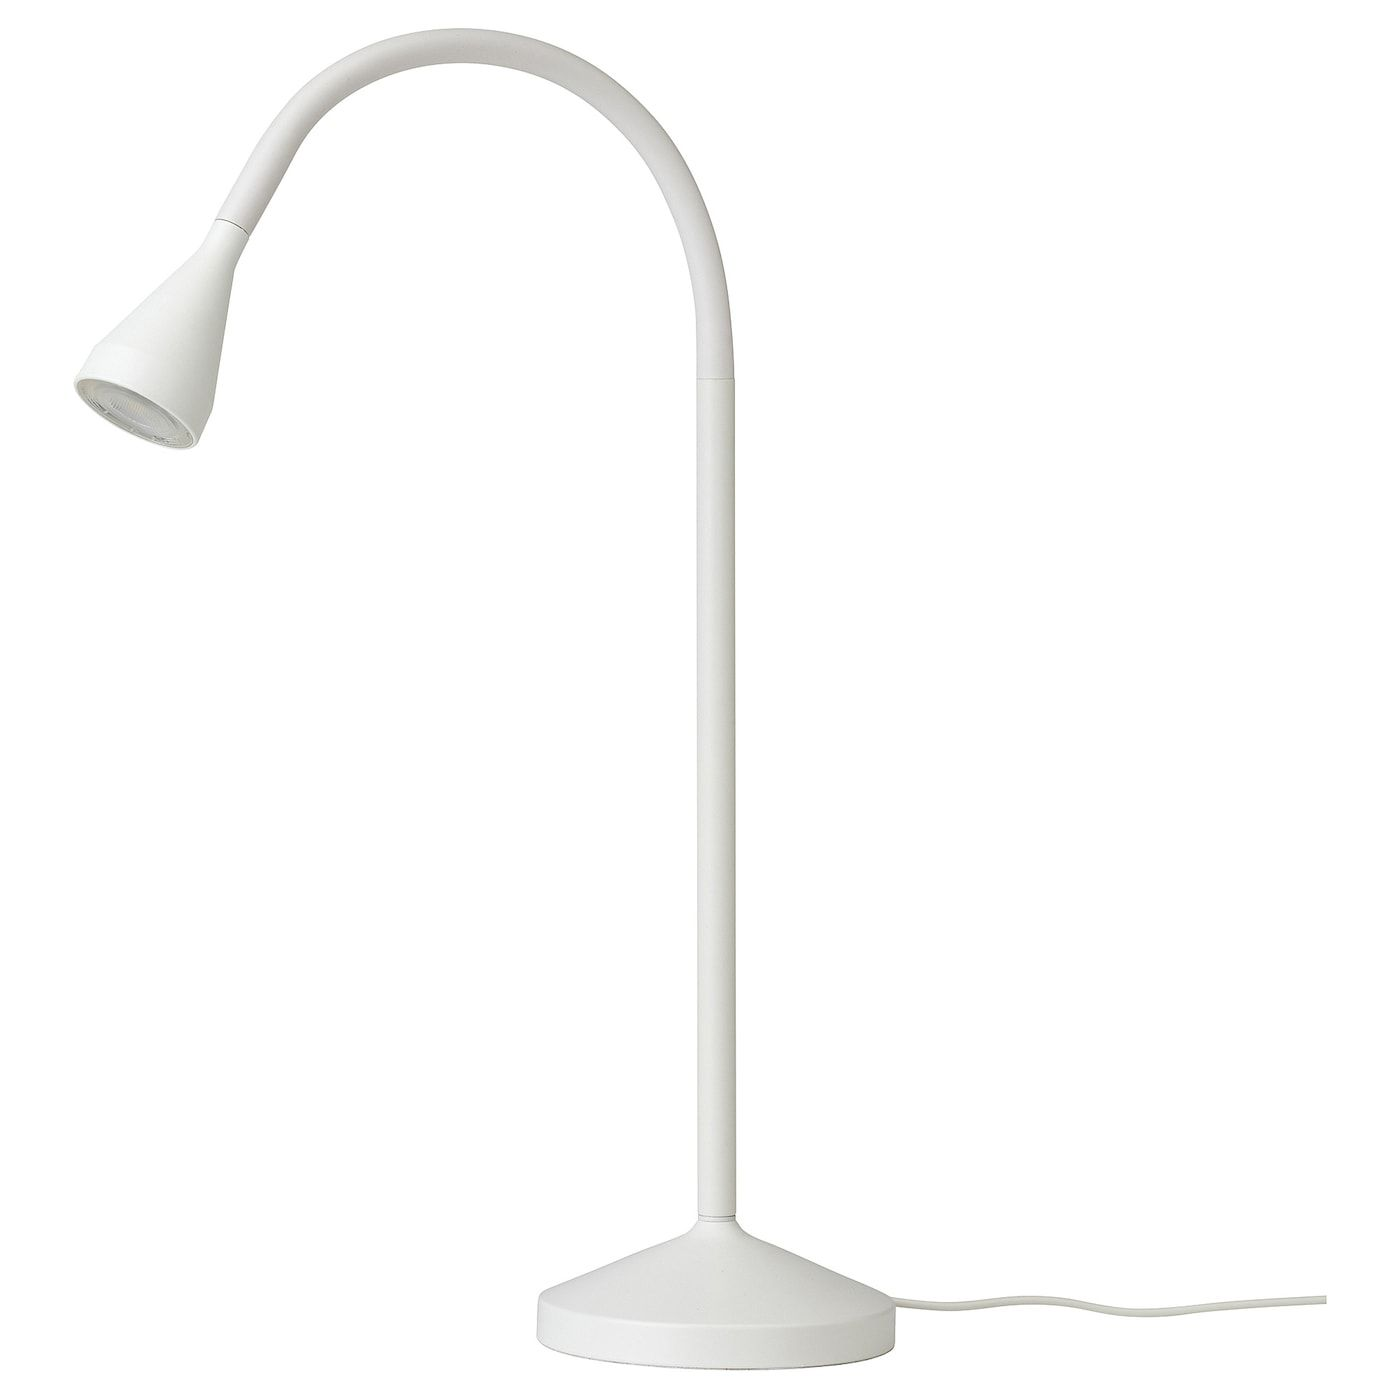 Navlinge Led Work Lamp White Ikea In 2020 Lamp Work Lamp Ikea